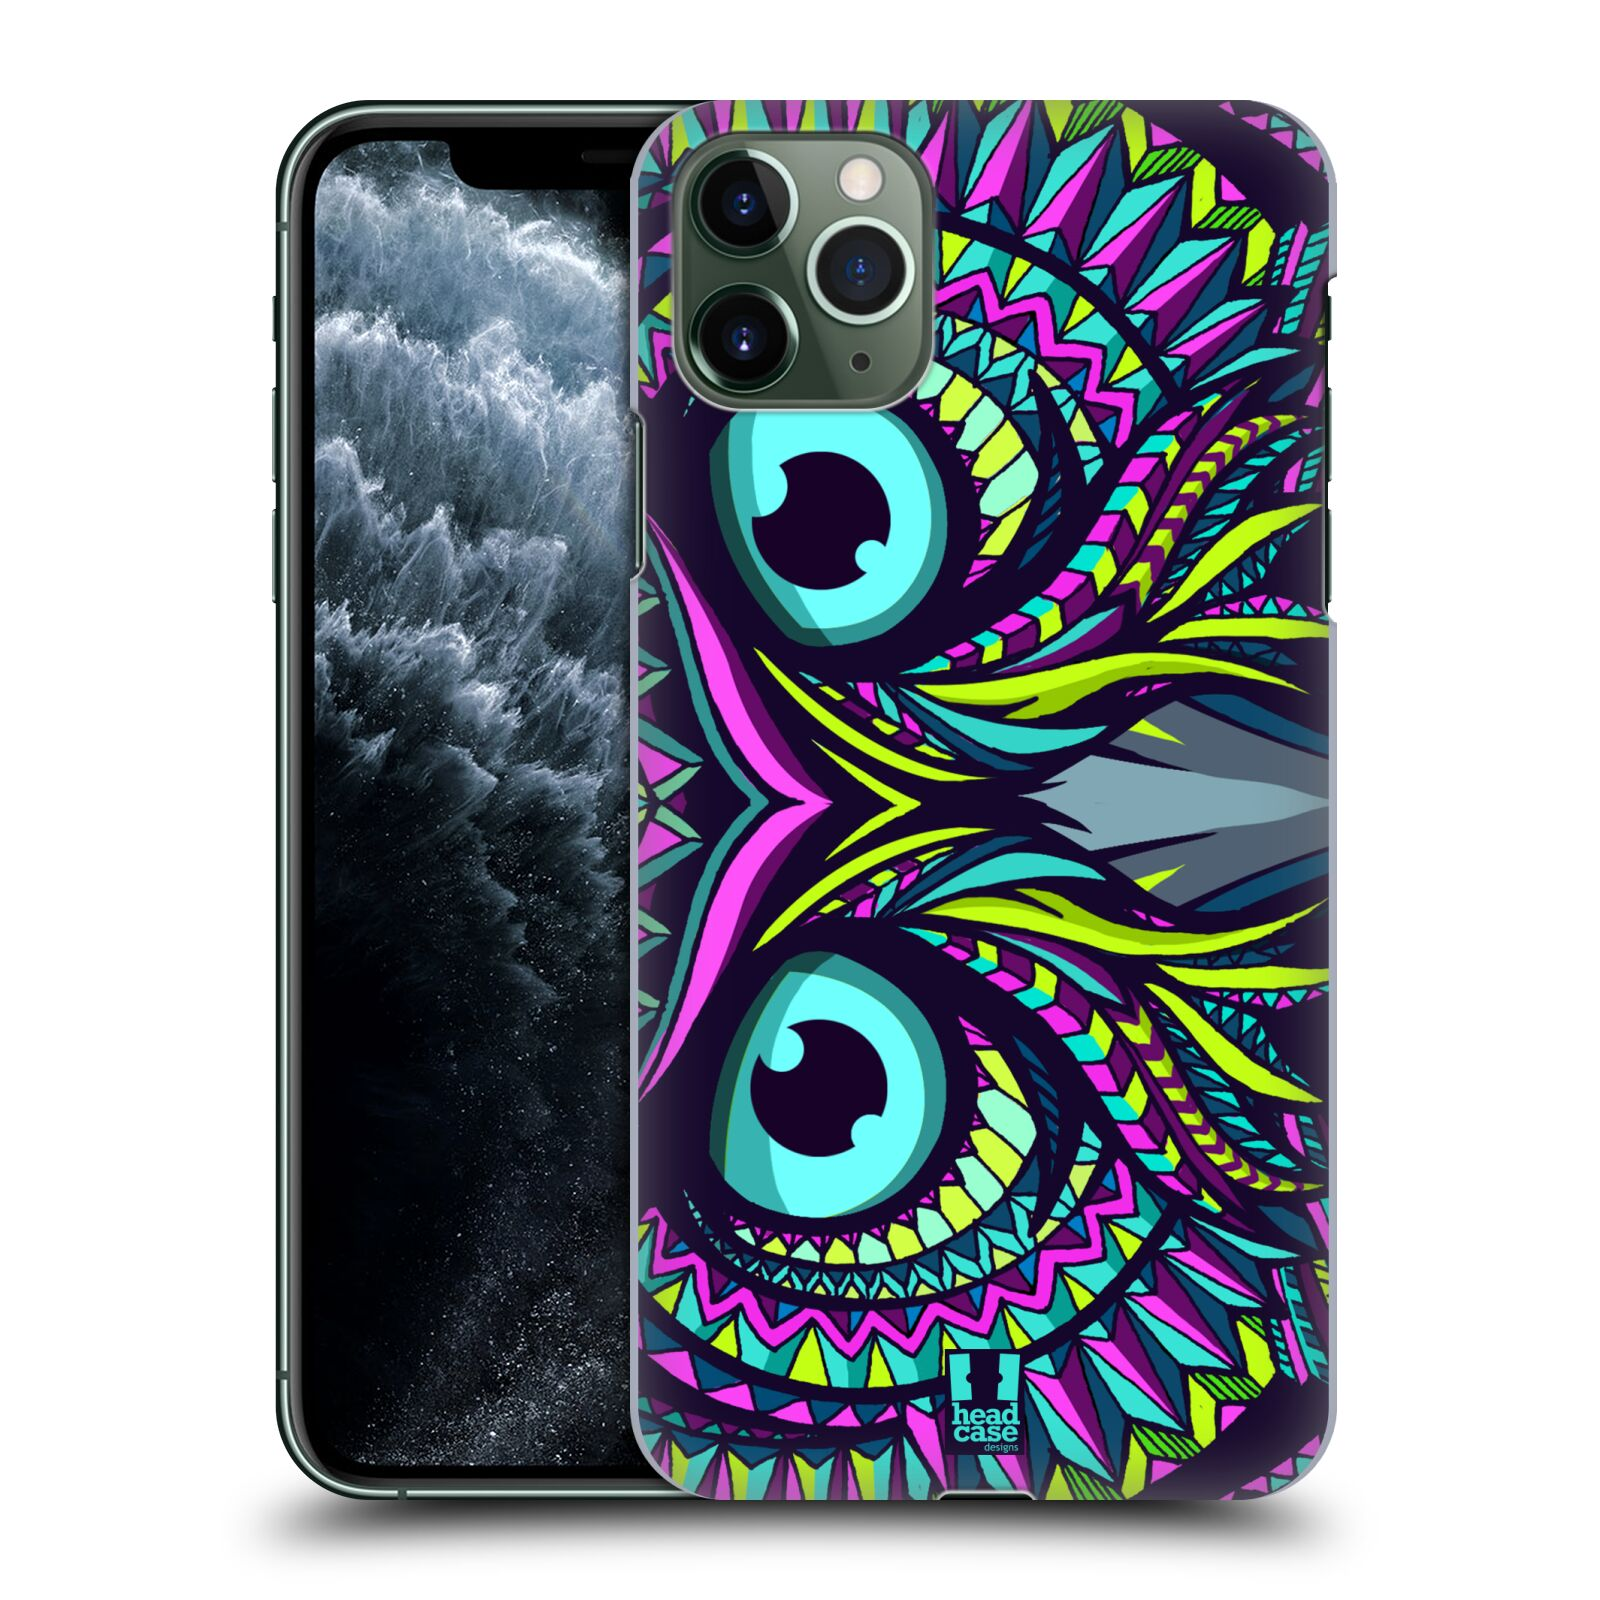 Plastové pouzdro na mobil Apple iPhone 11 Pro Max - Head Case - AZTEC SOVA